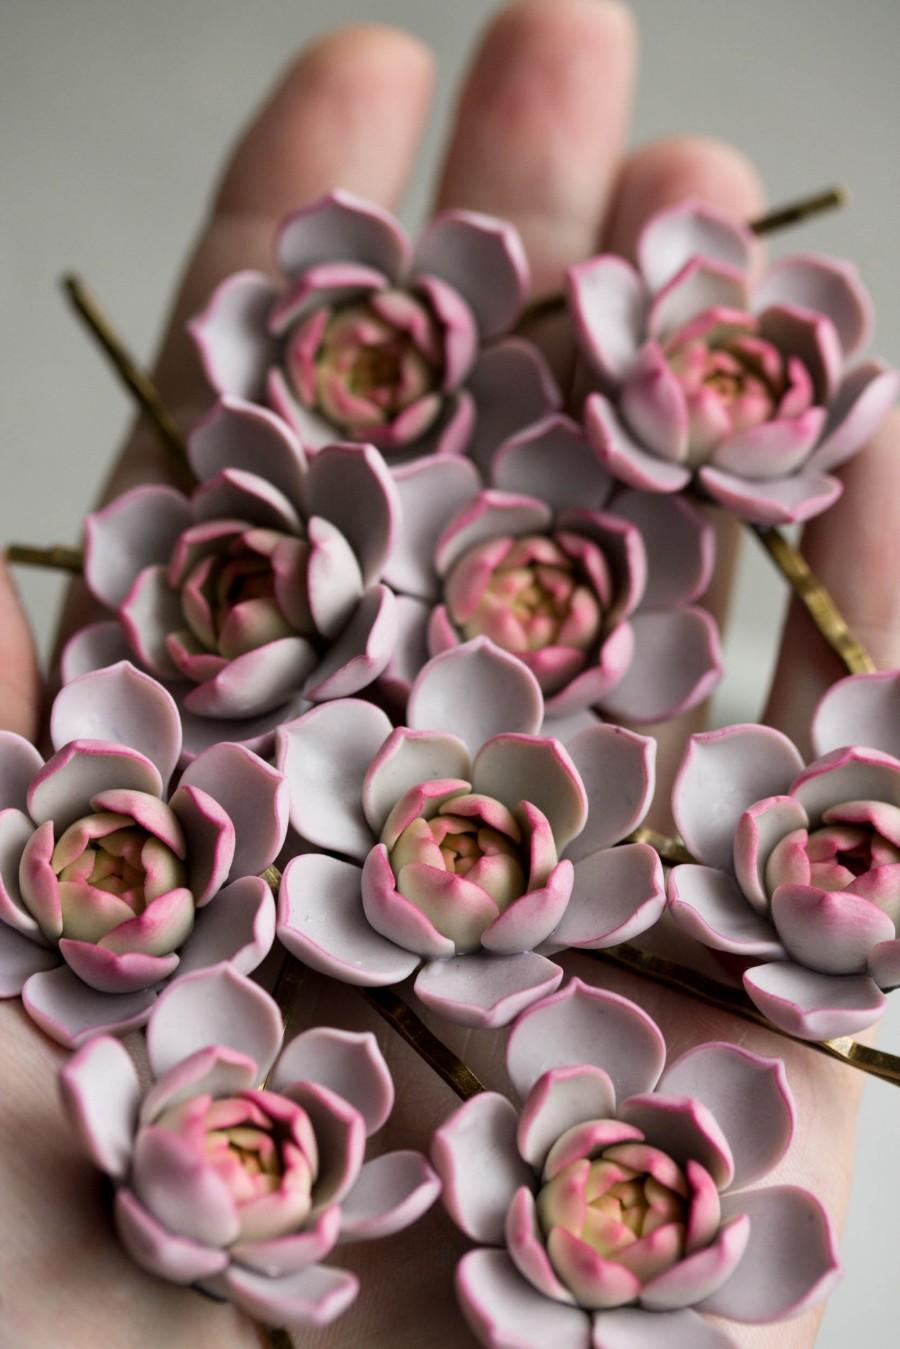 Hochzeit - 1 pcs purple Succulent Hair Pins Hairpin  Bobby Pins Hair Buy succulents plant ideas Accessory Women Handmade Decoration Bridal Hair